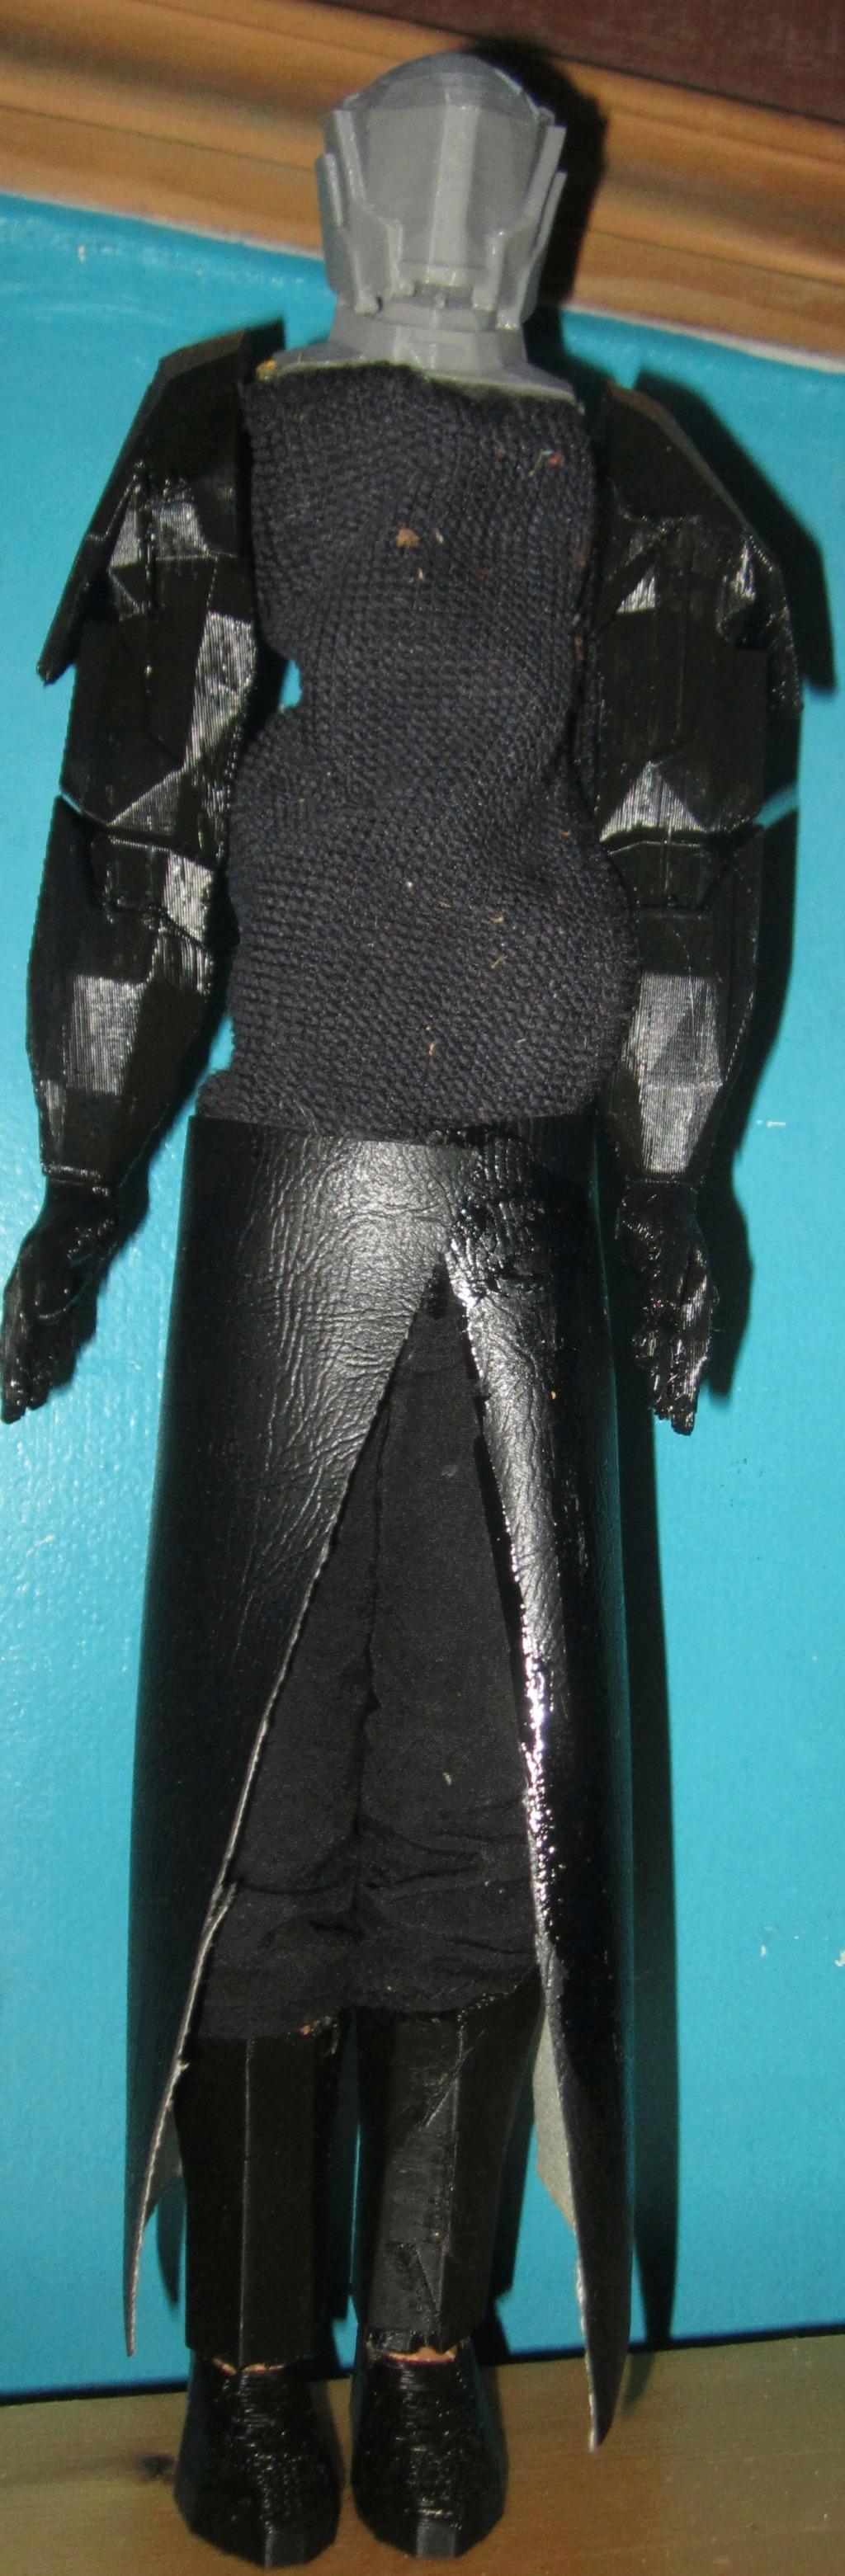 "[Terminé] Terran Task Force ""Junk Knight"" au 1/6eme mécanisé Img_5126"